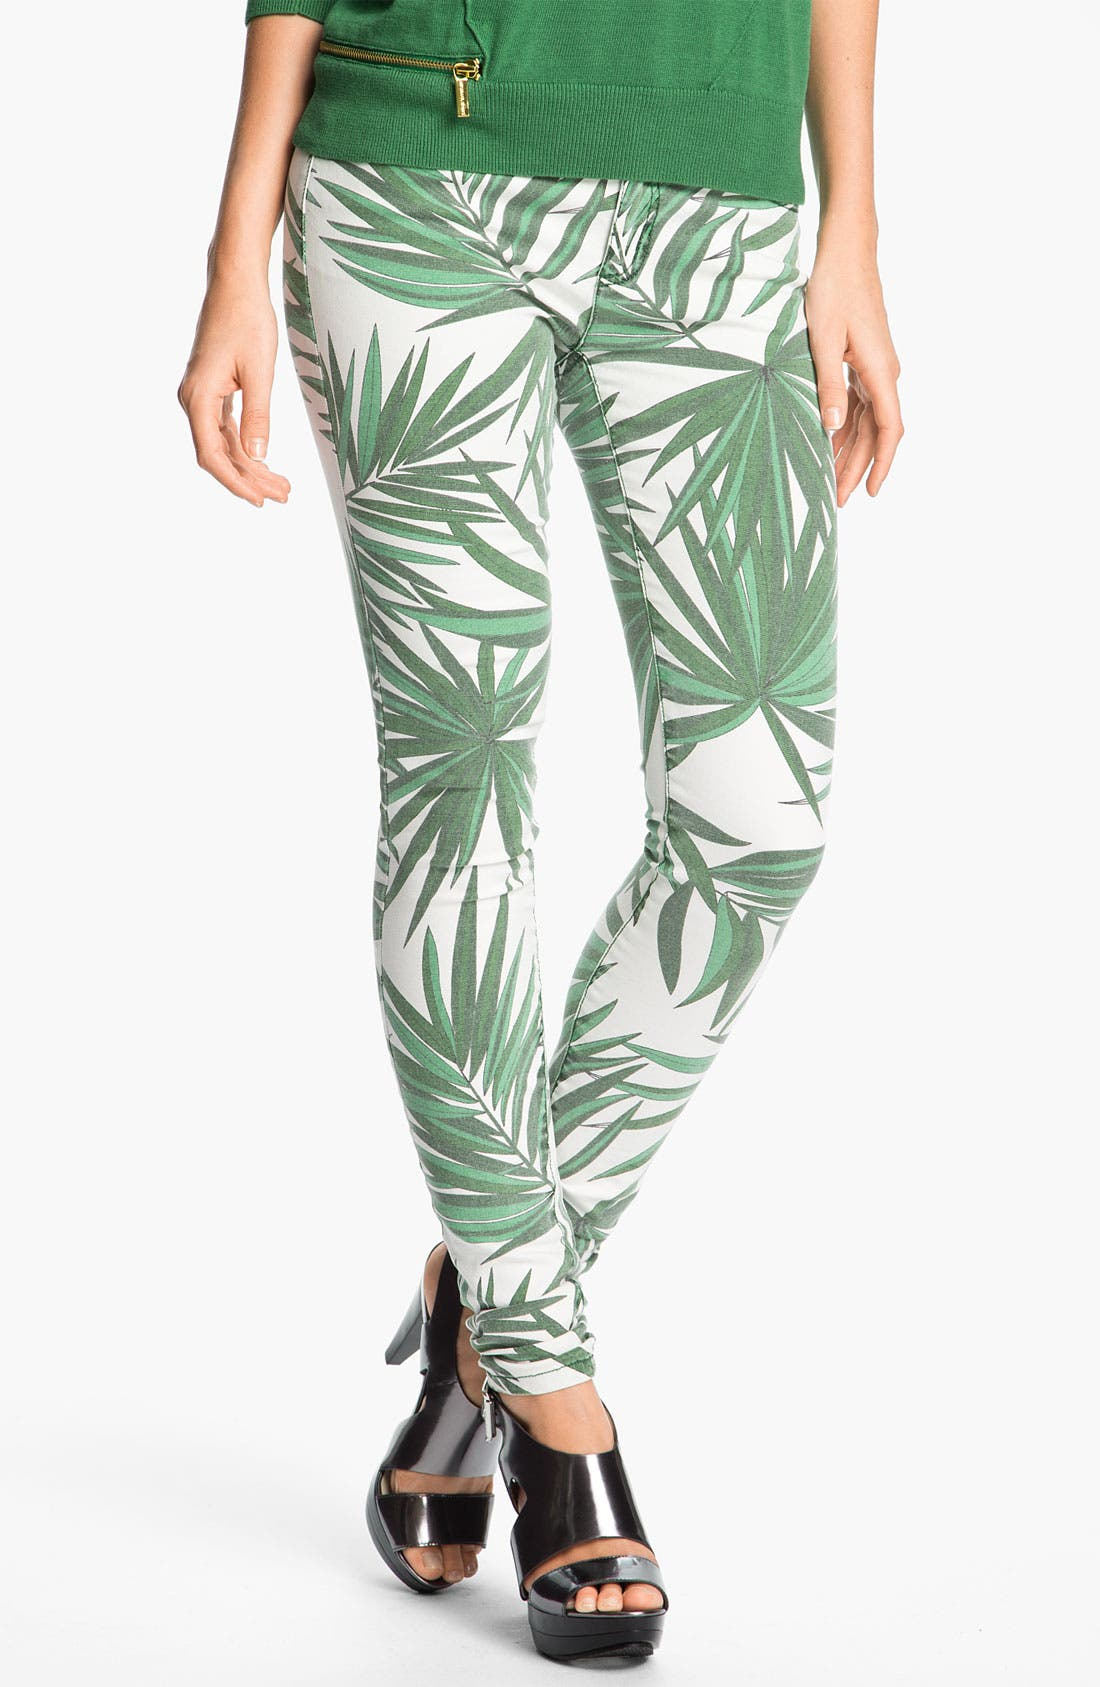 Alternate Image 1 Selected - MICHAEL Michael Kors 'Tropical Palm' Skinny Jeans (Petite)